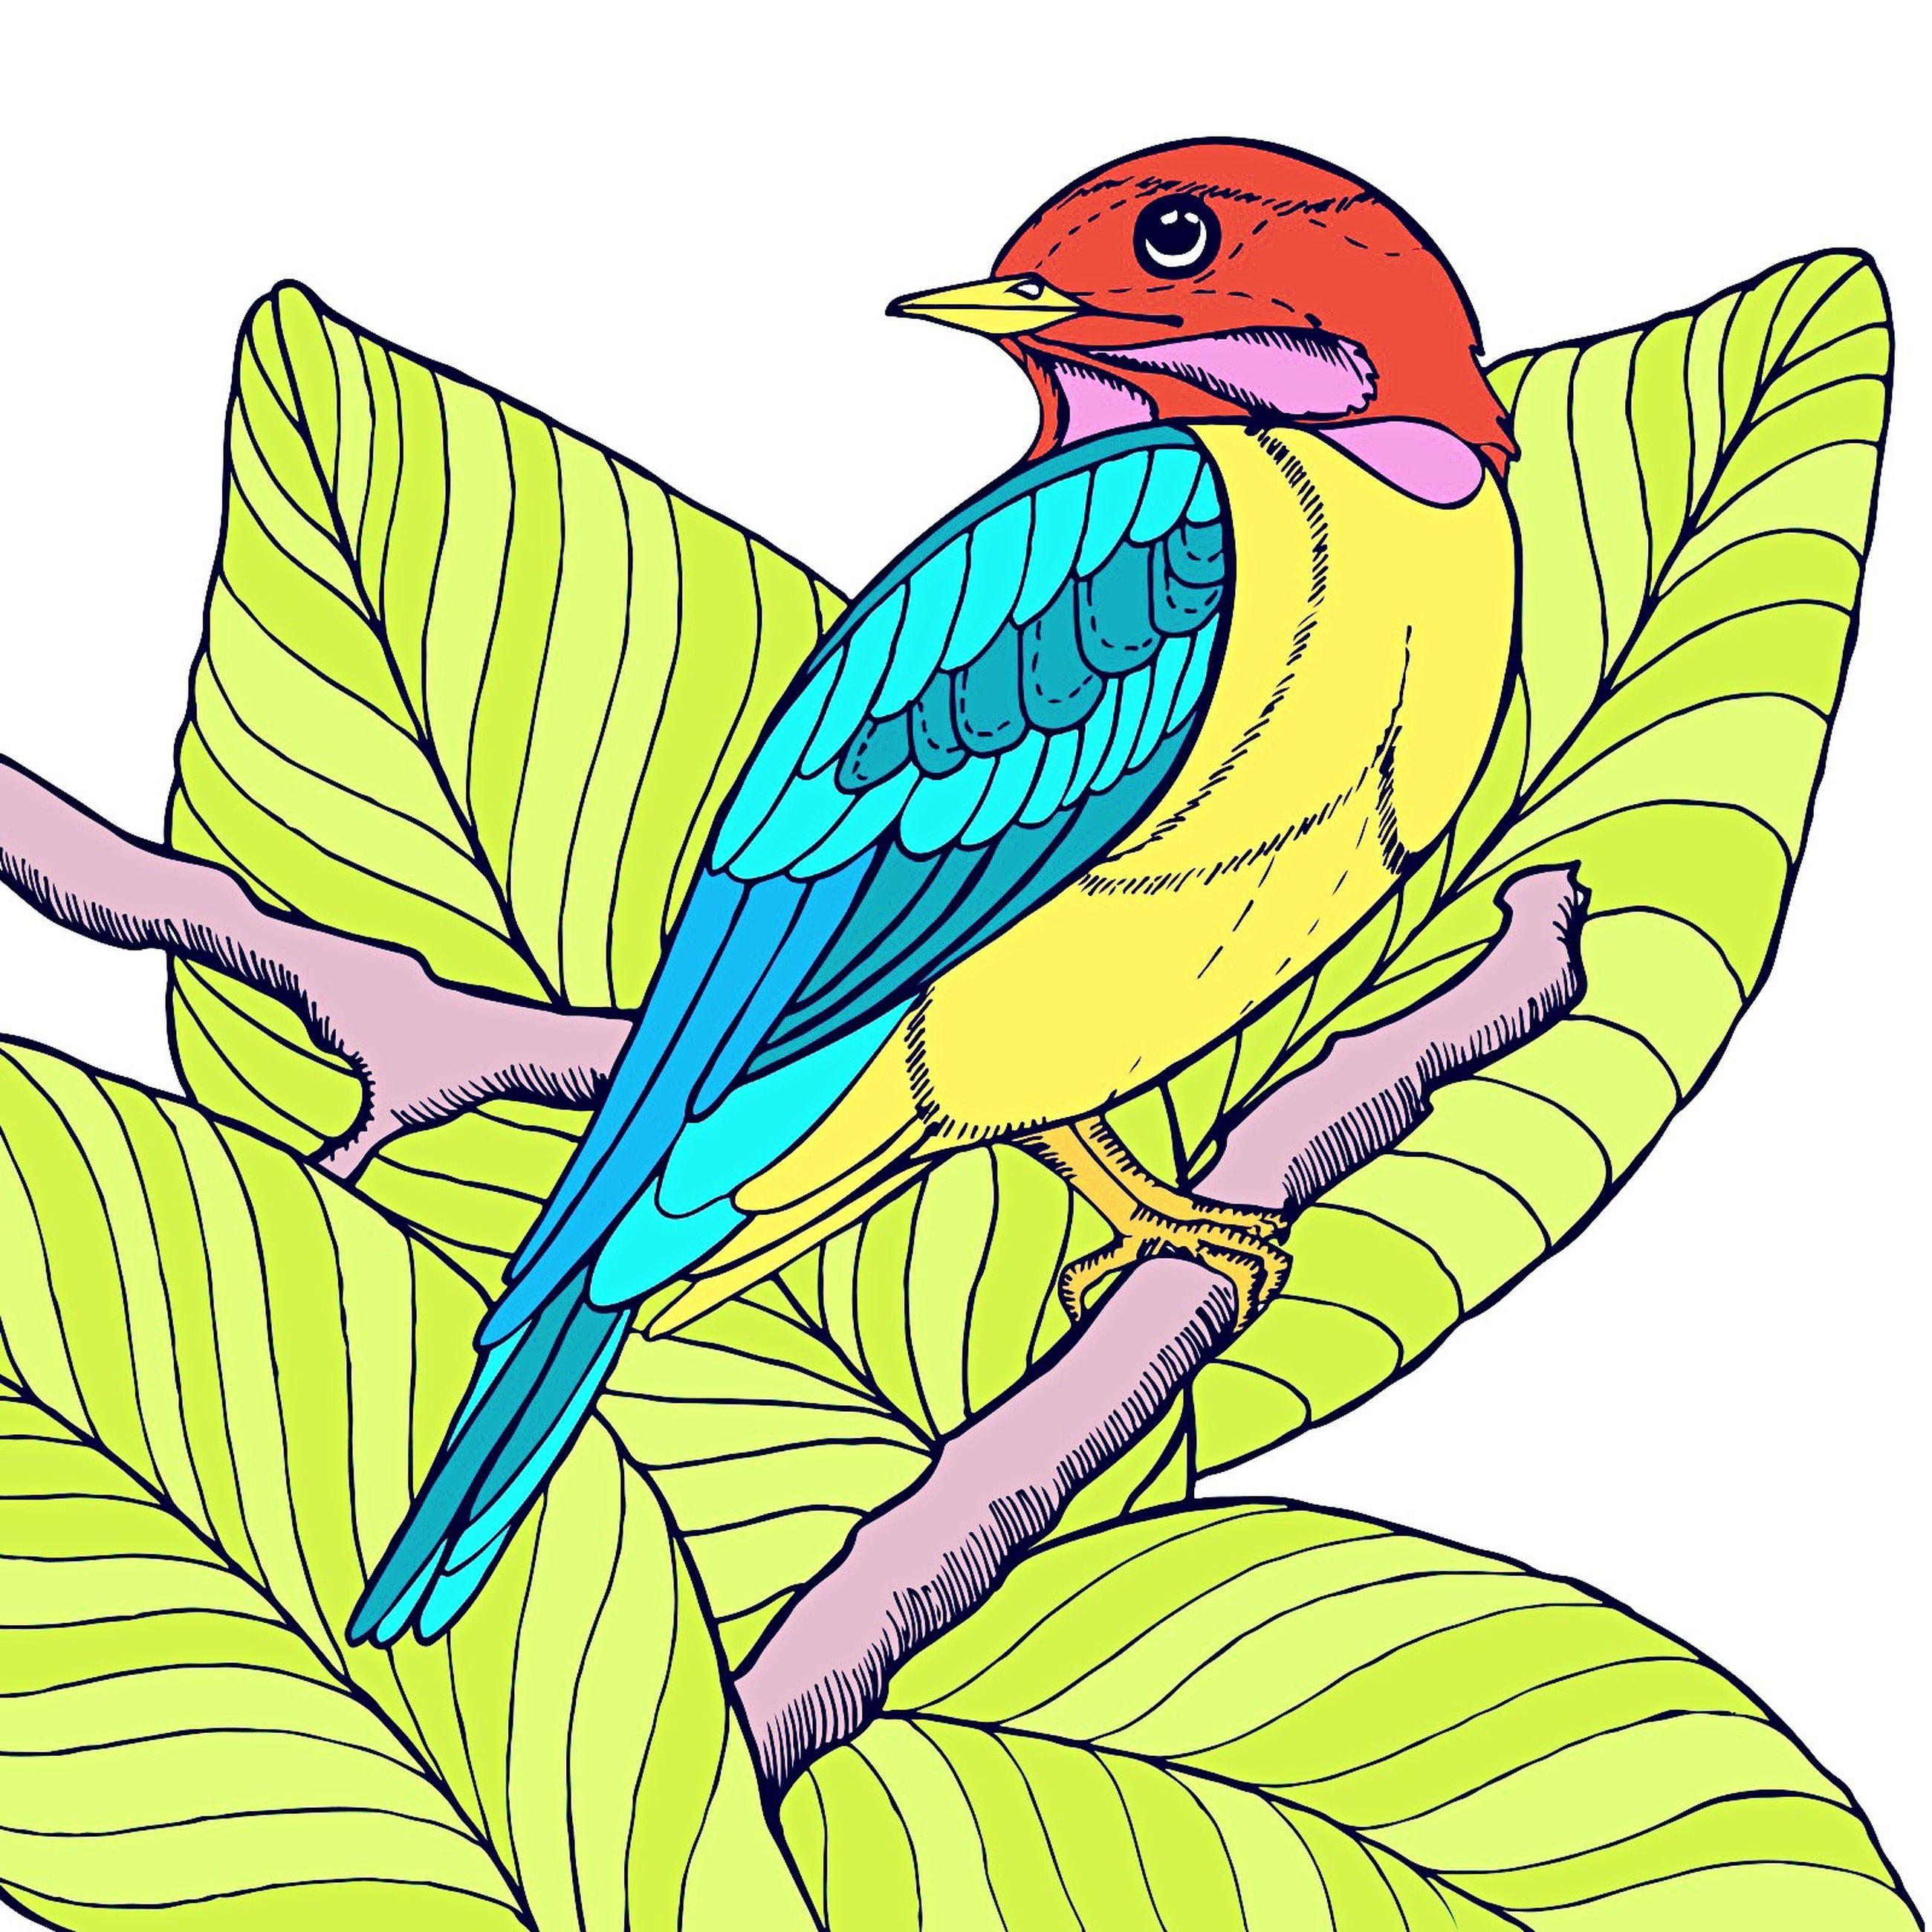 bird, animal, one animal, outdoors, parrot, no people, chameleon